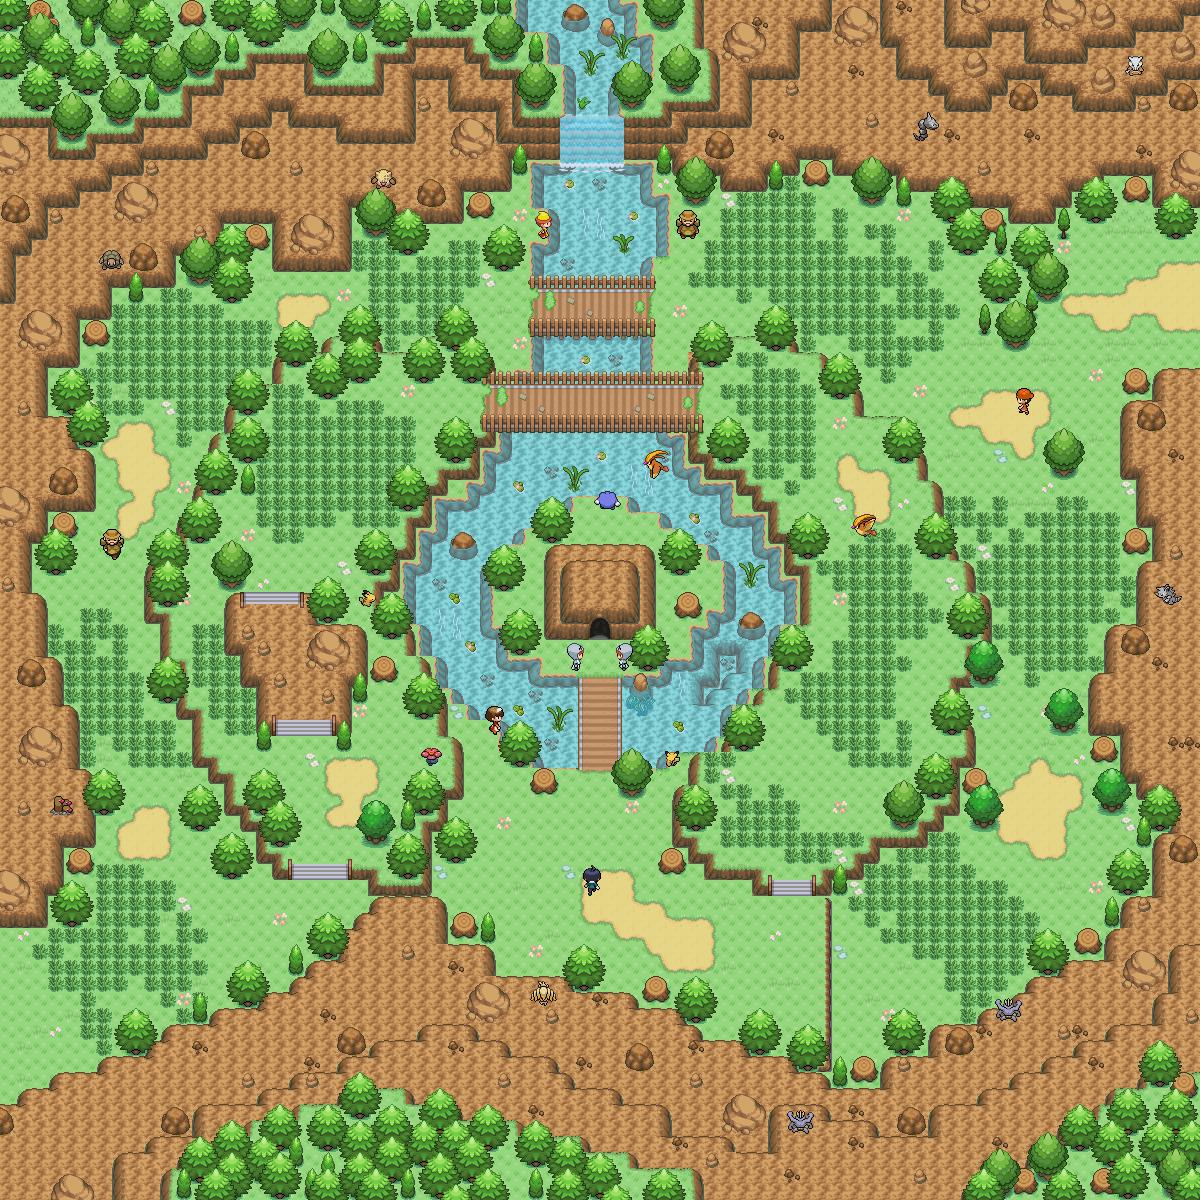 Pokémon-Map: Ruinental